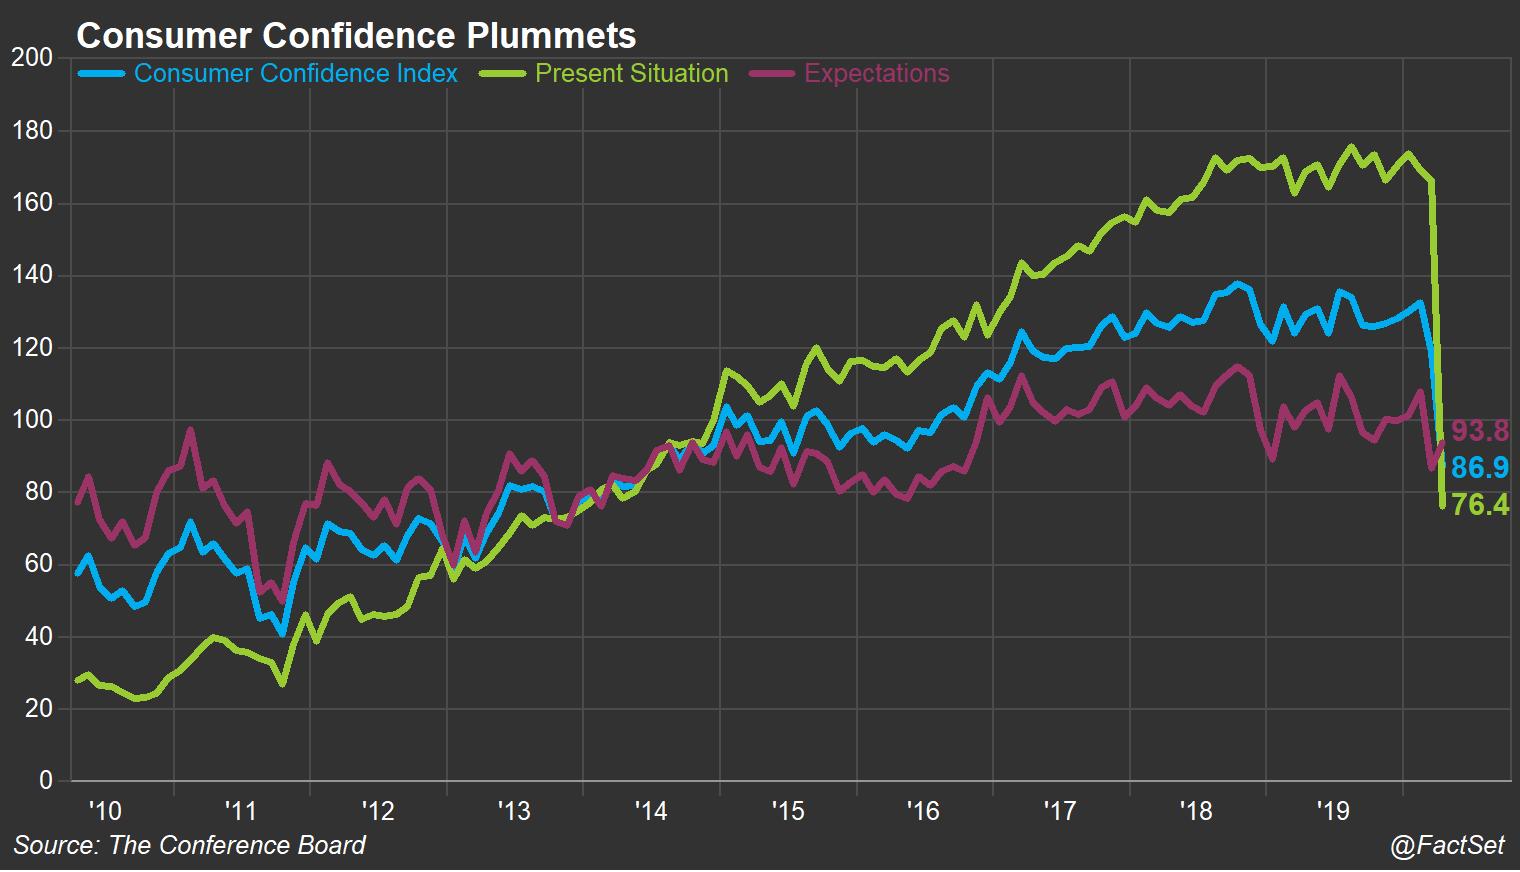 US Consumer Confidence